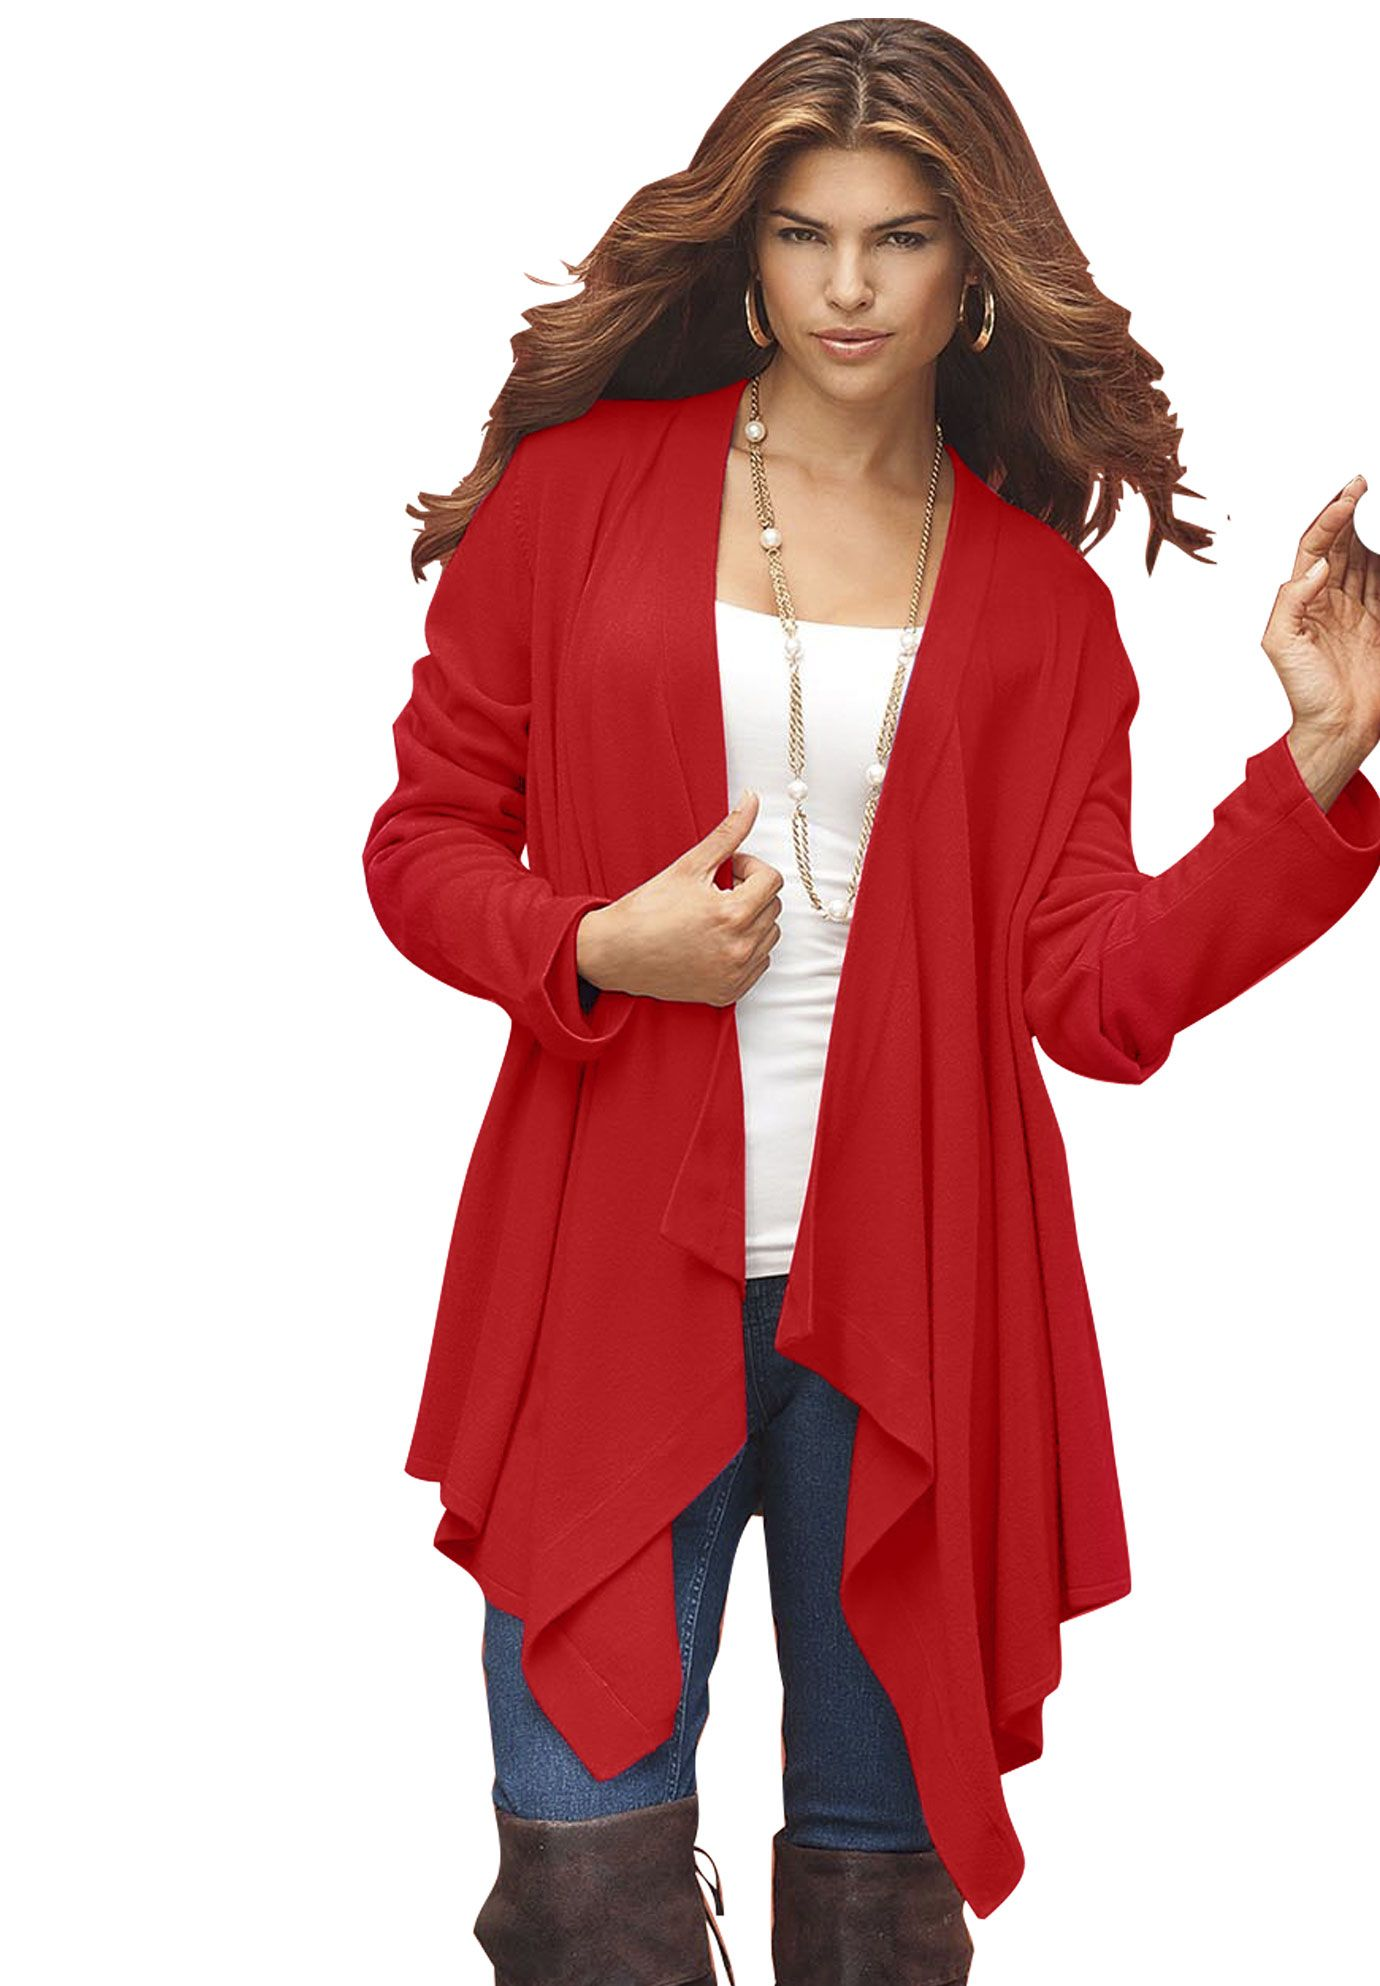 Plus Size Hankie Cardigan Image Plus Size Beauty Pinterest